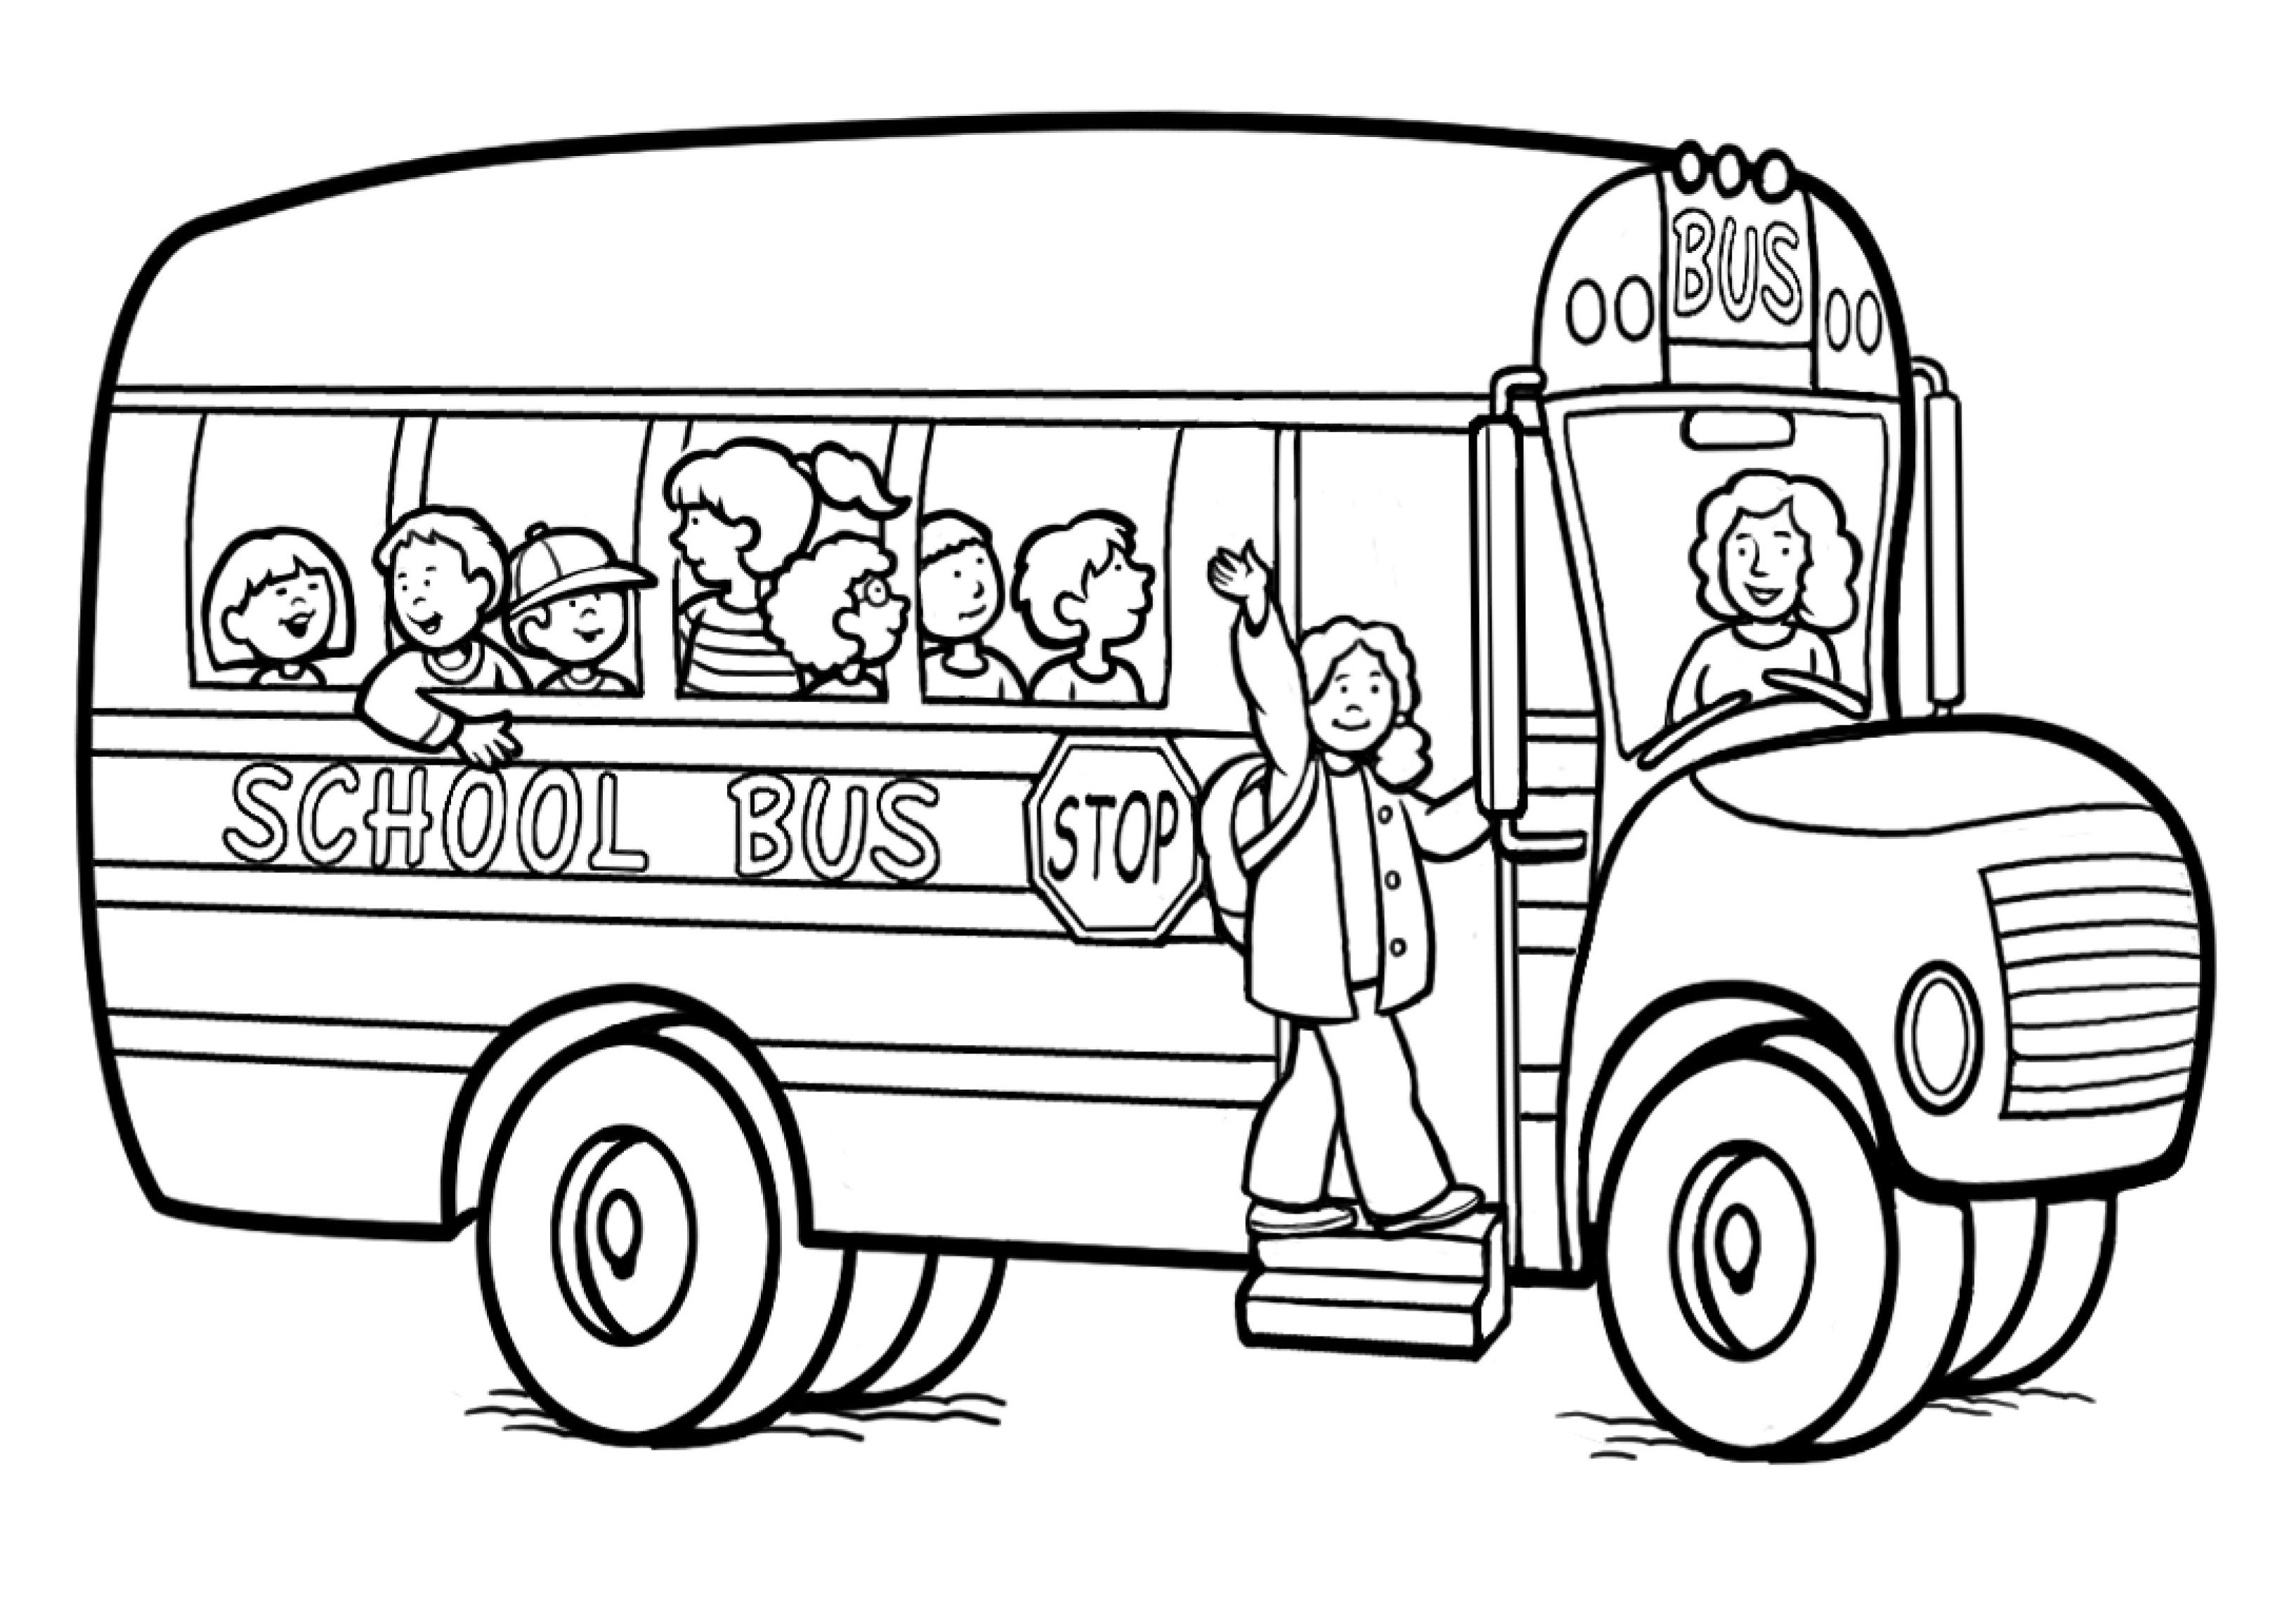 Bus Behavior Worksheet For Kindergarten